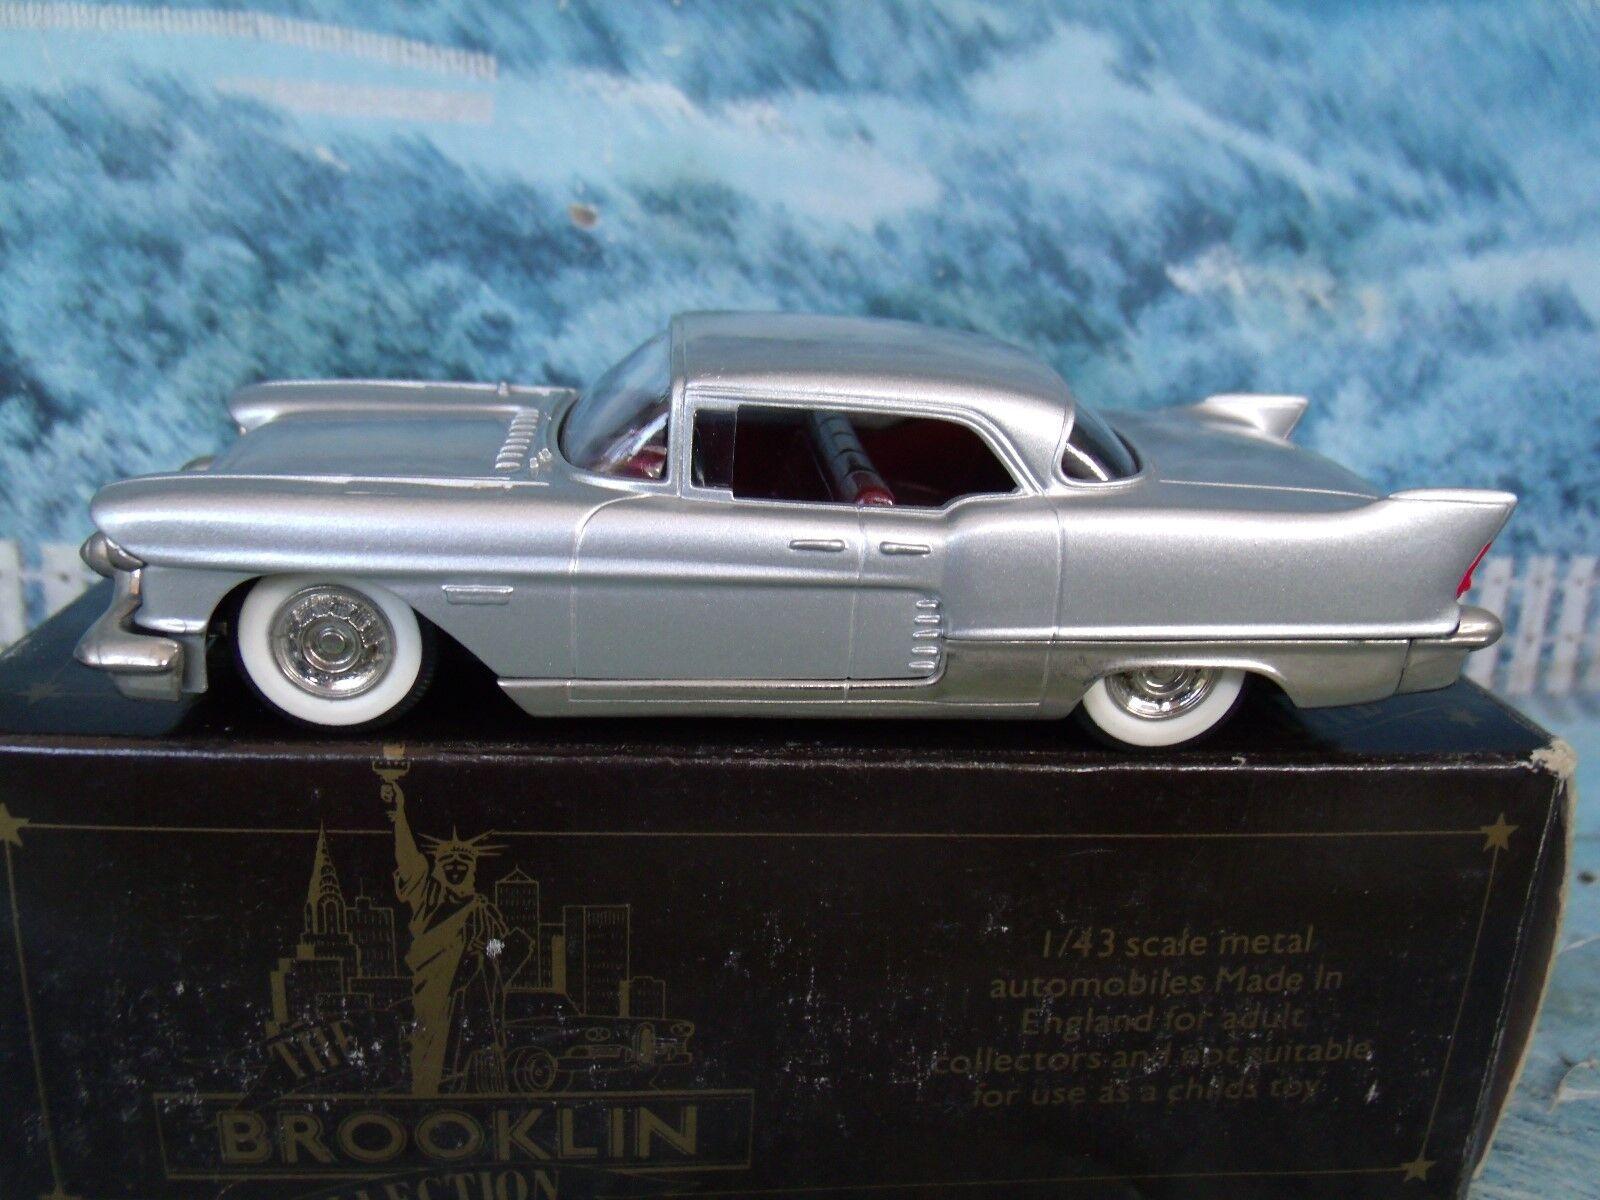 1/43 Brooklin models  BRK.27 1957 CADILLAC Eldorado Brougham bianca metal